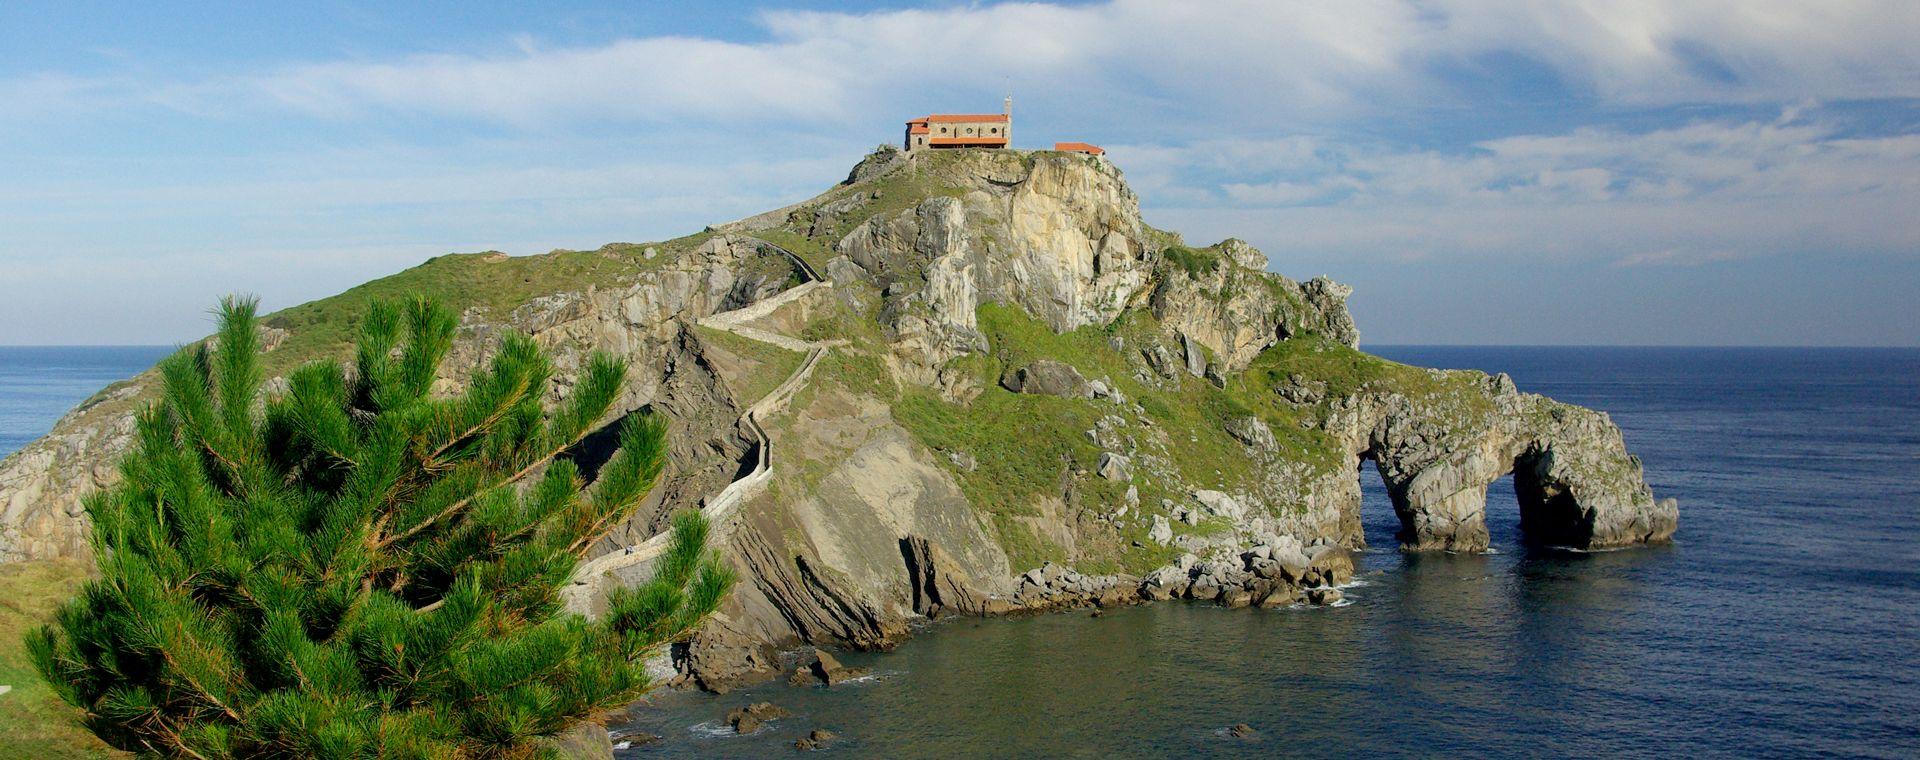 Image La Traversée de la côte basque, de Zumai à Bilbao